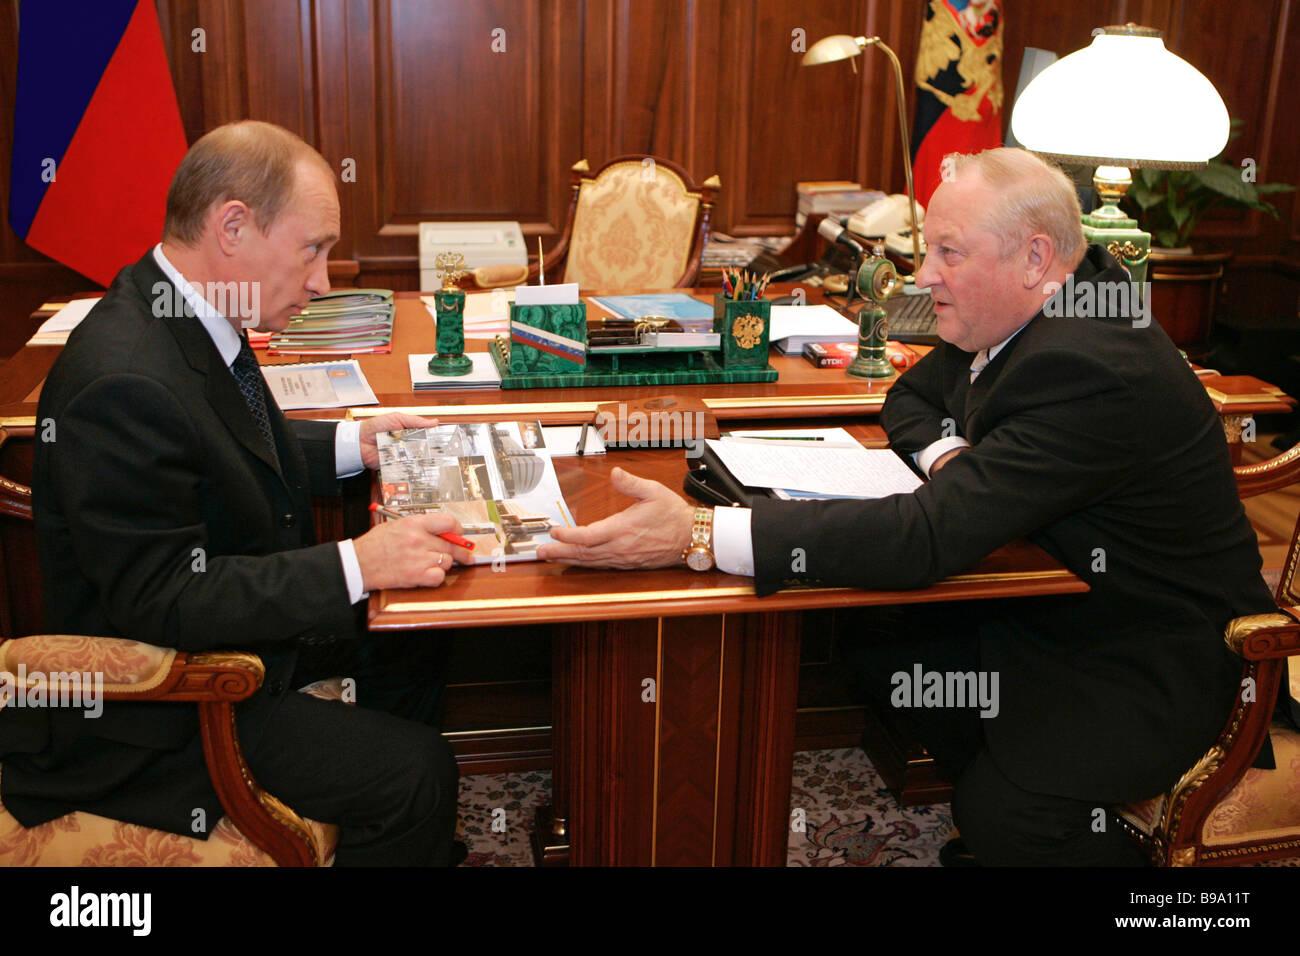 President elects new heads of Karelia, Sverdlovsk and Irkutsk regions 23.05.2012 52